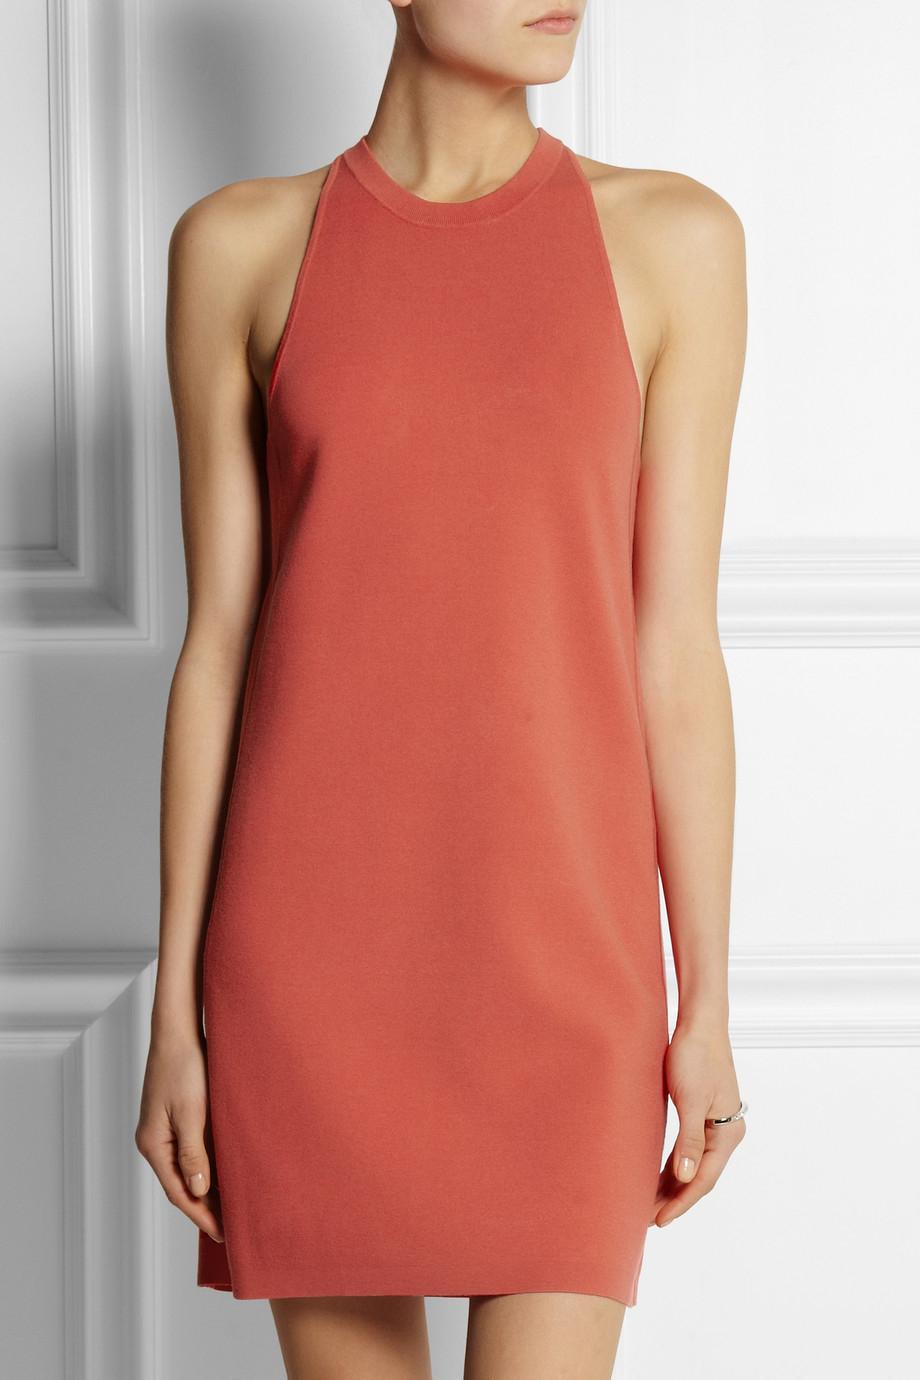 Theory Red Dress - Jill Dress